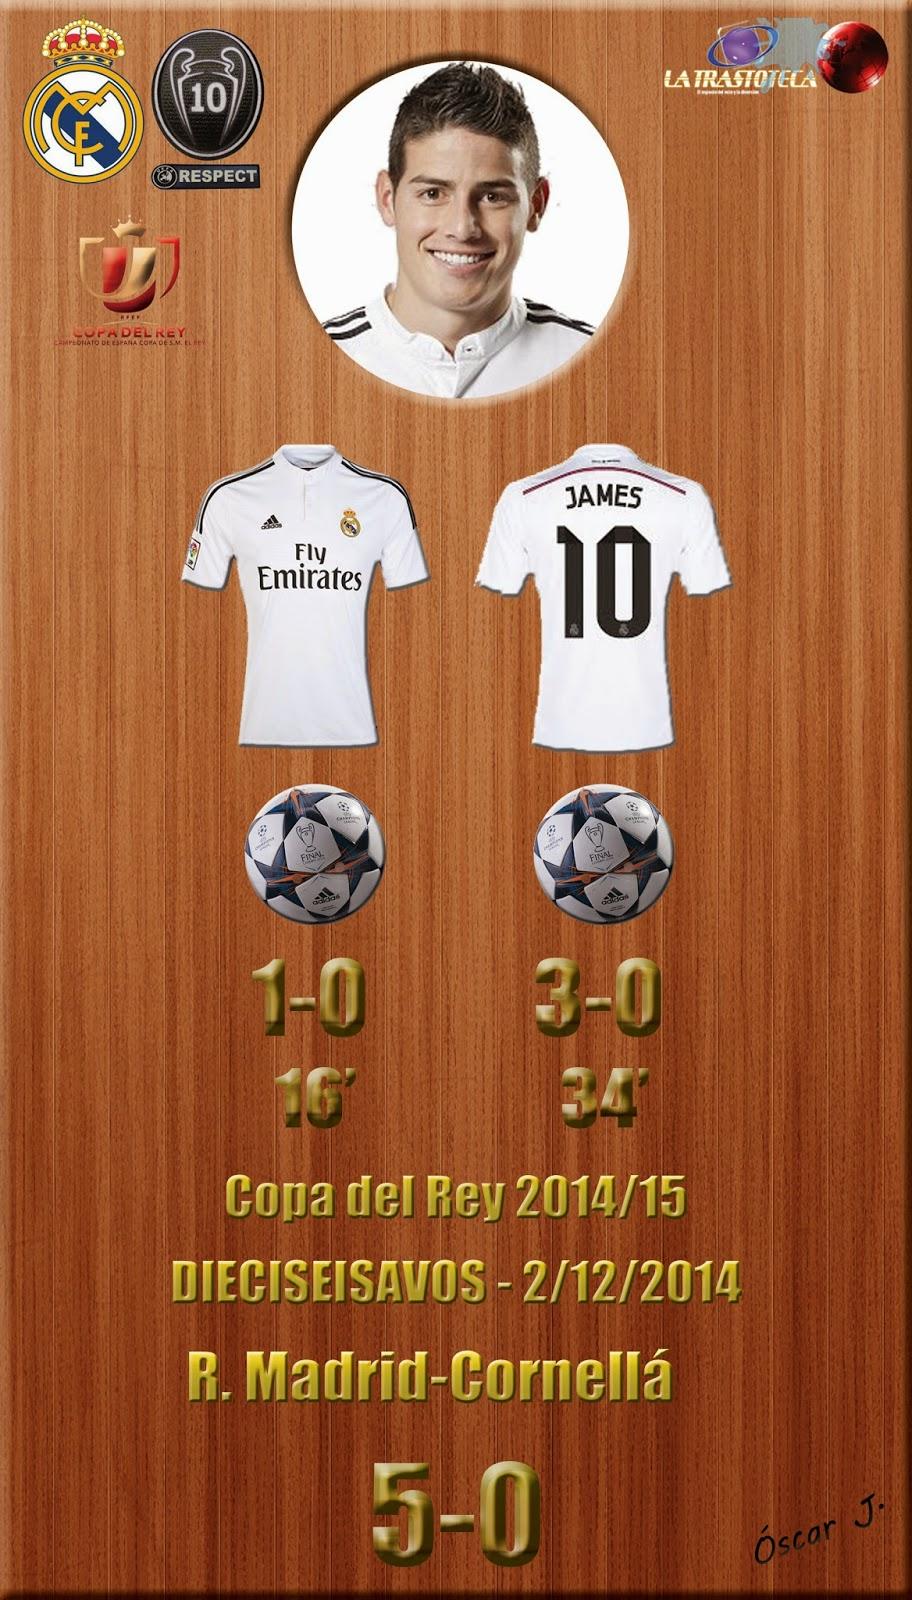 James Rodríguez - Doblete - Real Madrid 5-0 Cornellá - Copa del Rey 2014/15 - Dieciseisavos - (2/12/2014)